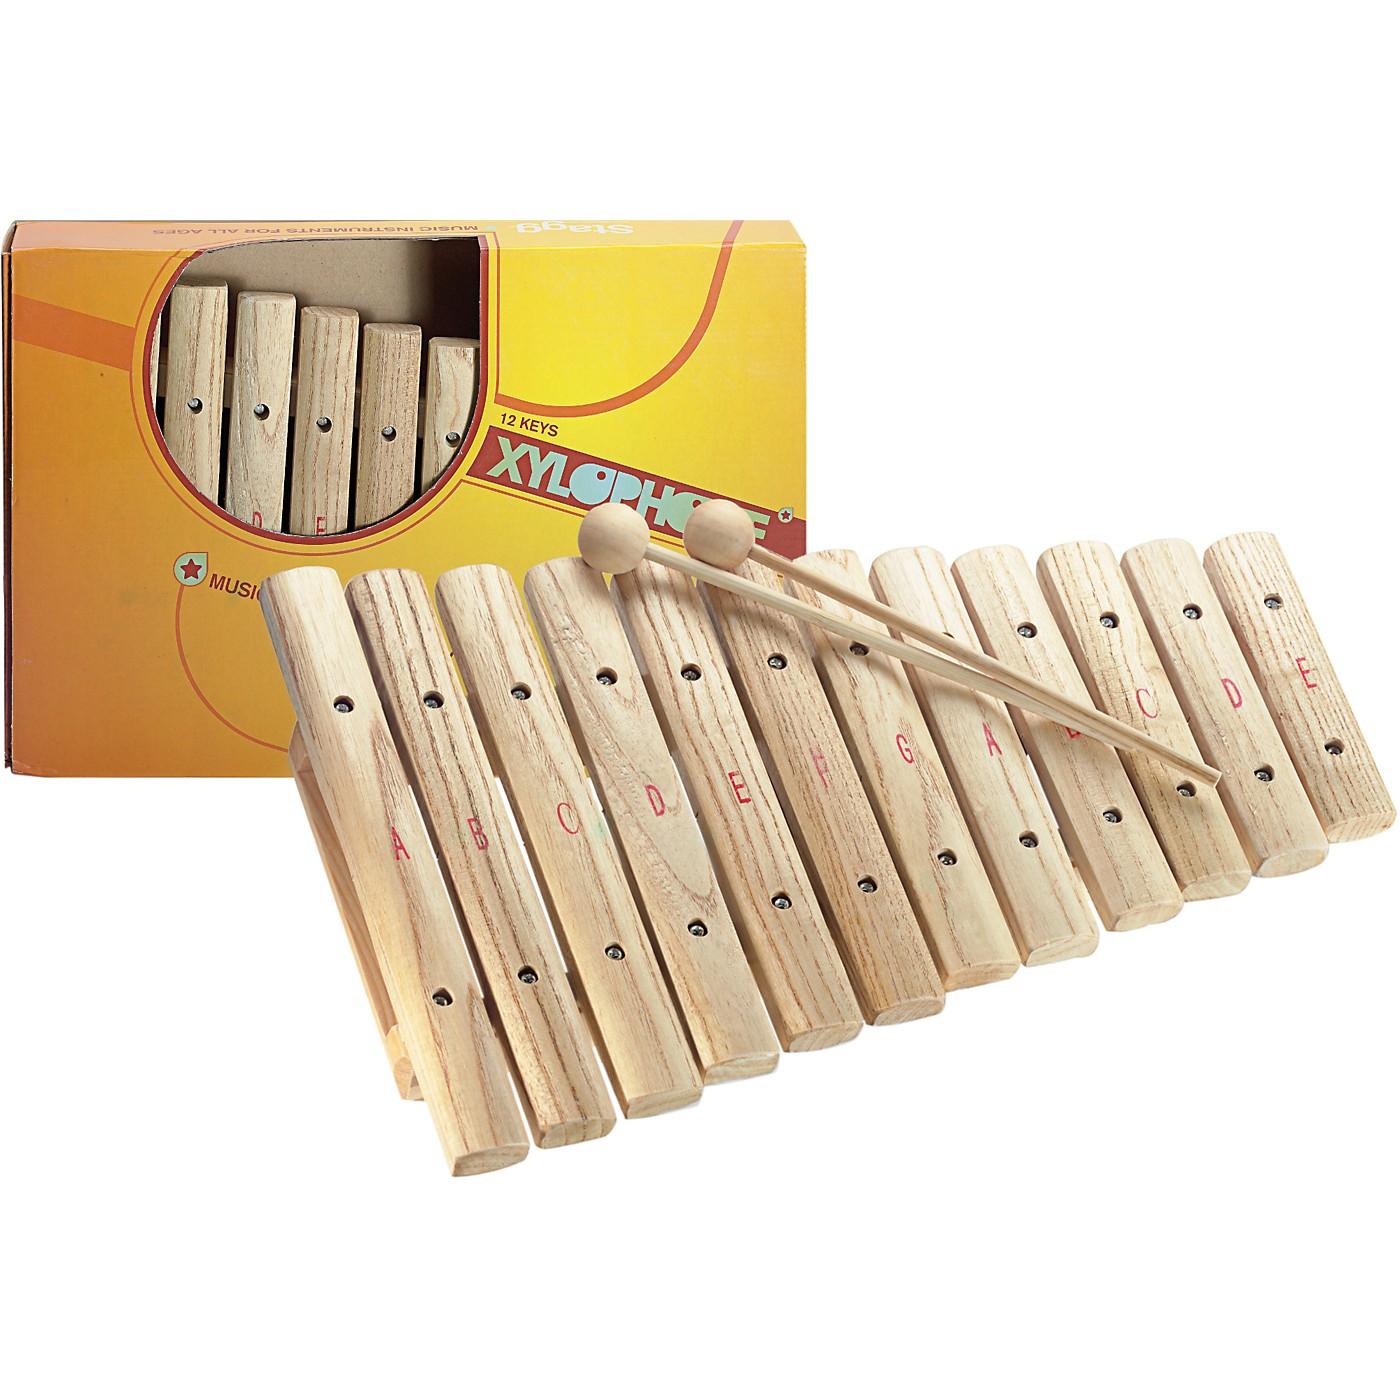 Stagg Xylophone, 12 Keys, A-E thumbnail